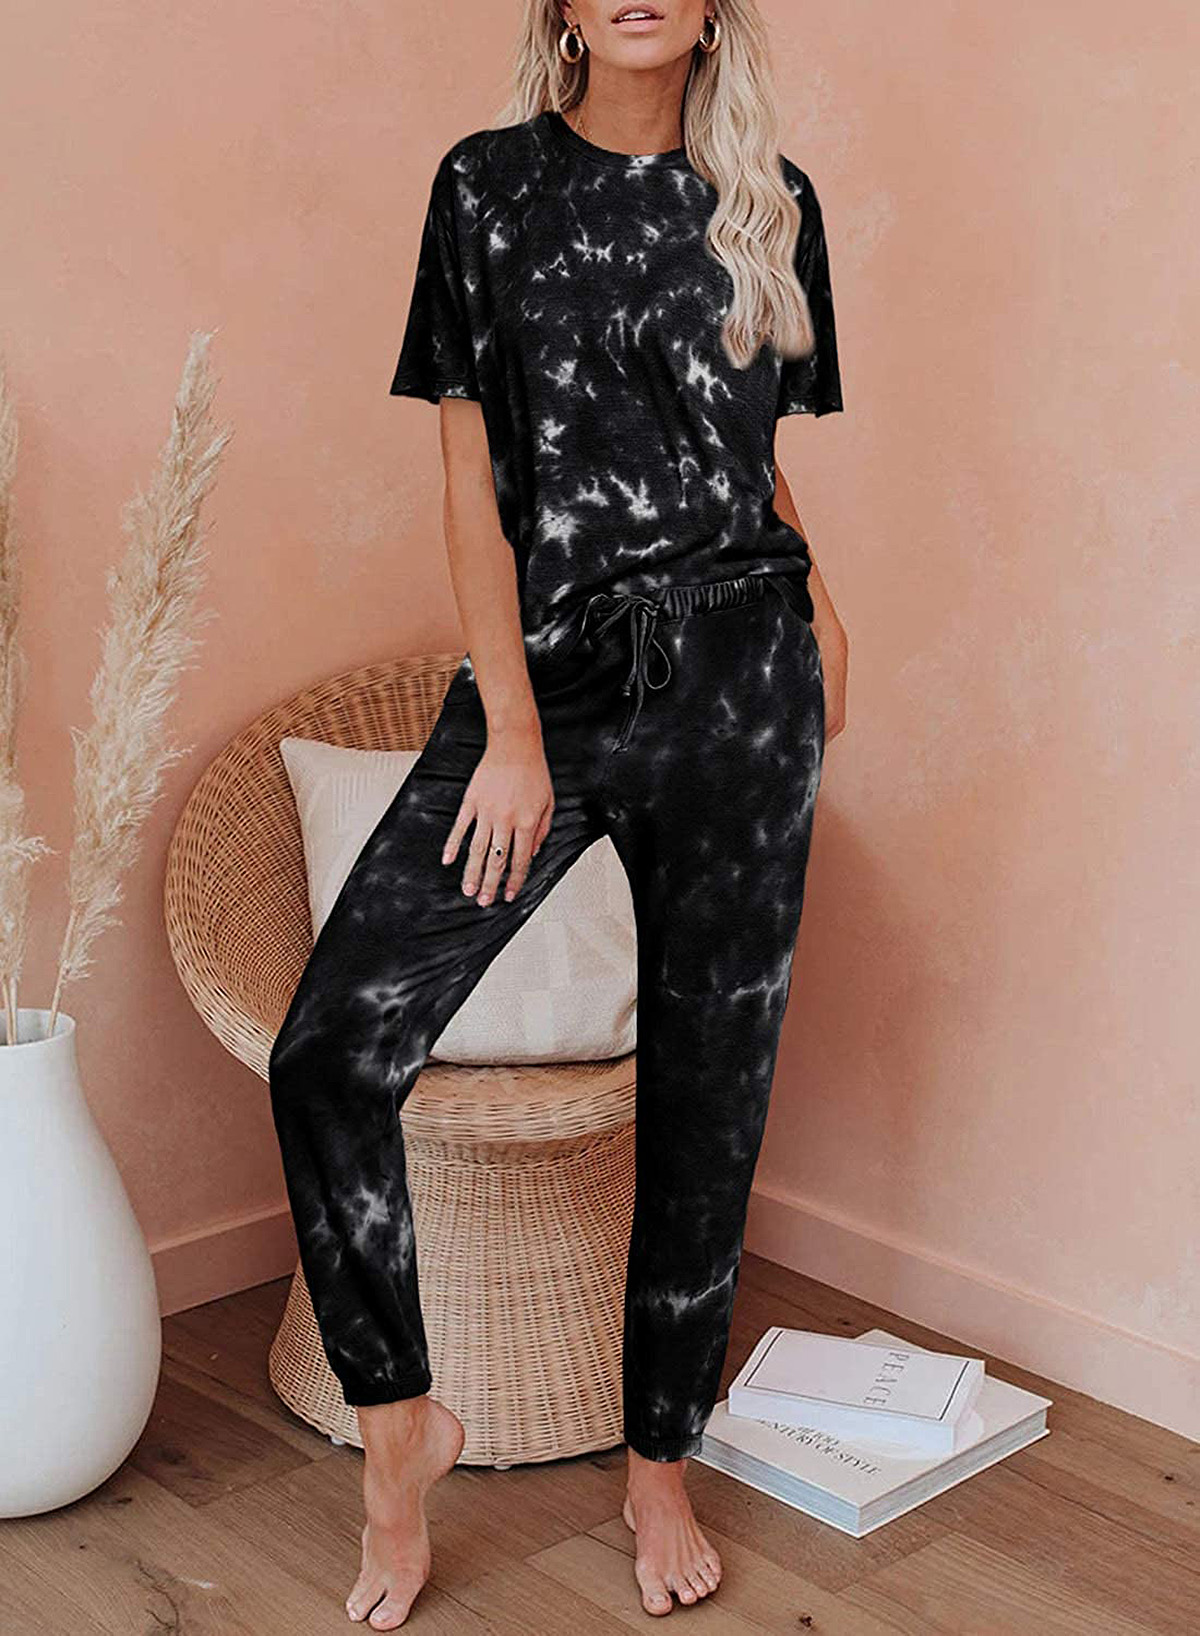 Elapsy Women's Tie-Dye Printed Pajama Set